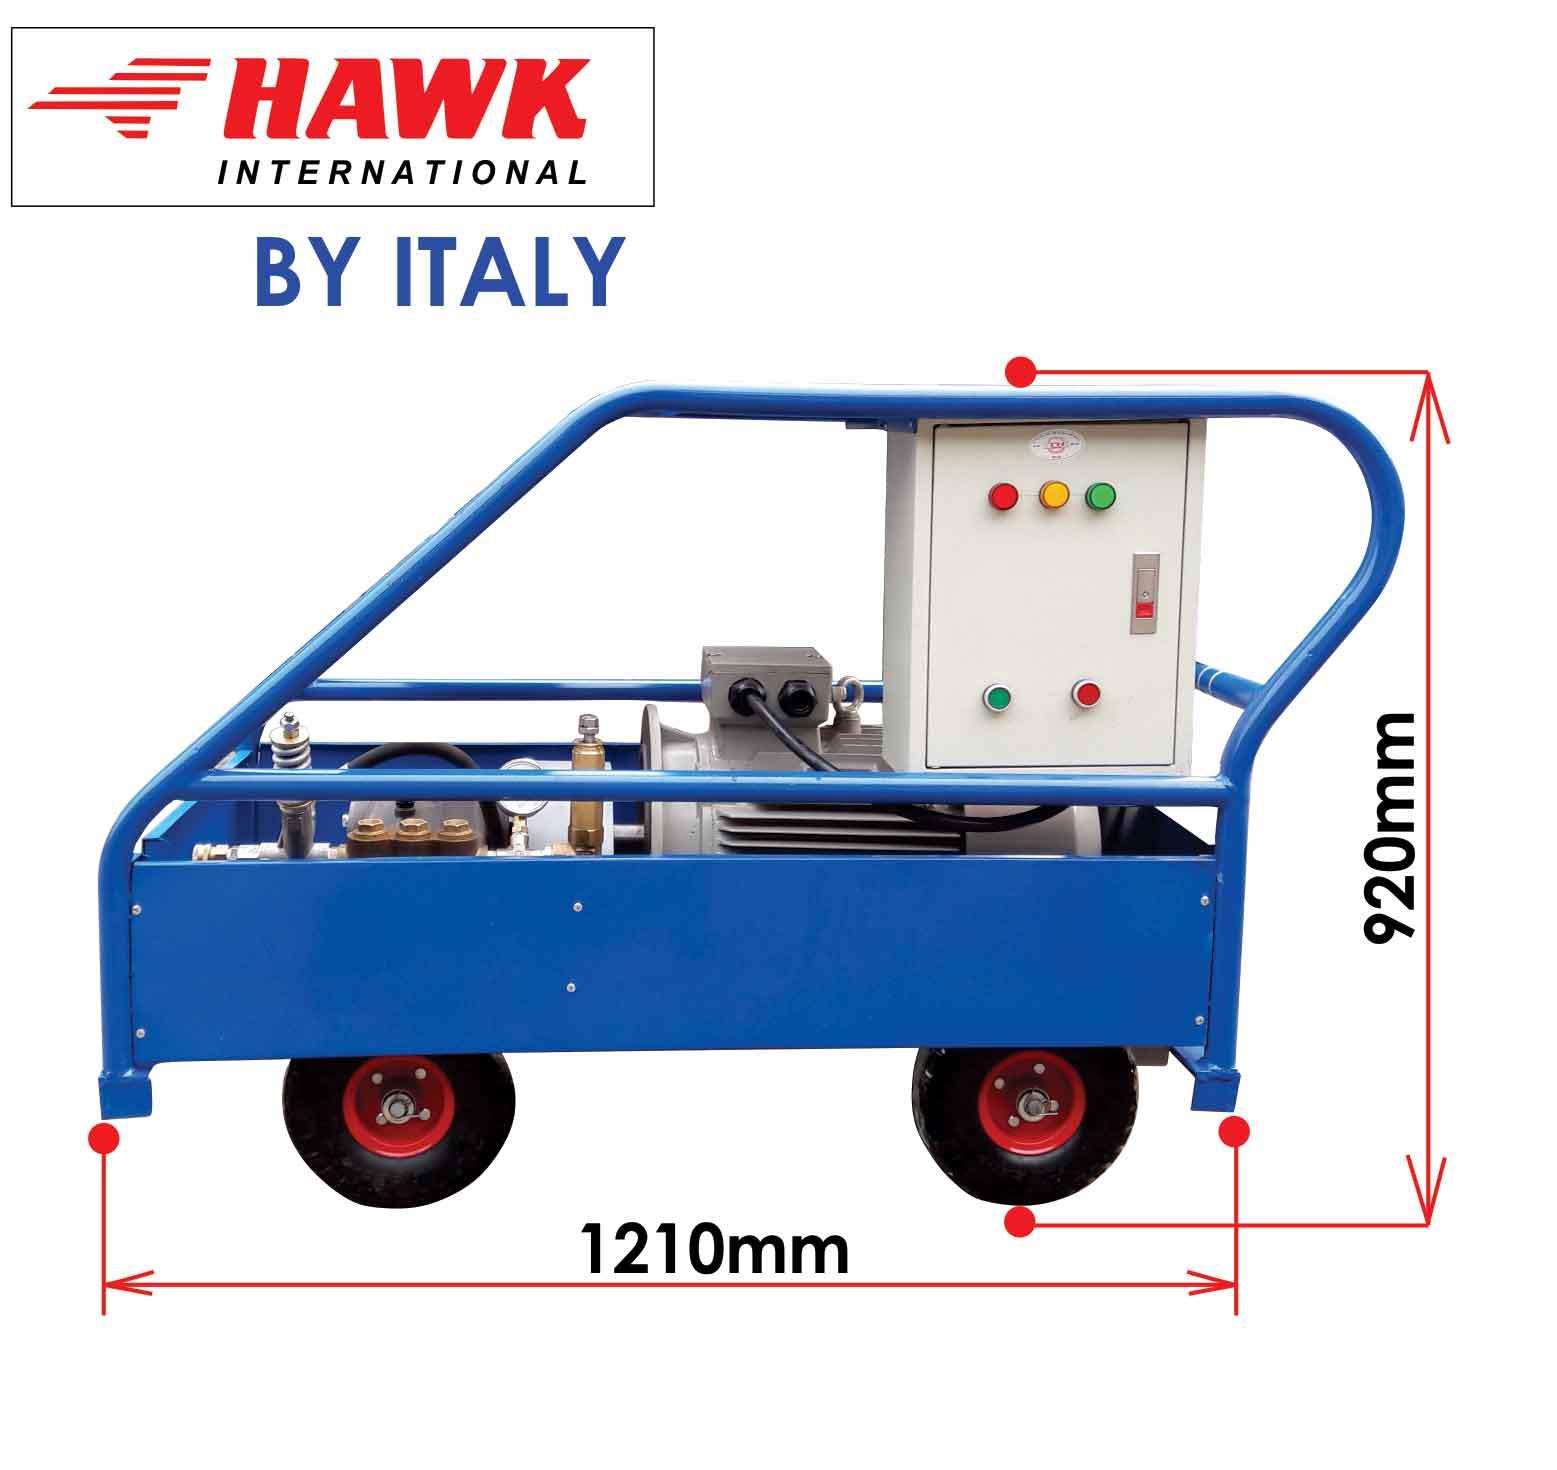 máy phun rửa công nghiệp 15KW , máy phun áp lực cao 15KW, máy rửa siêu áp 15KW